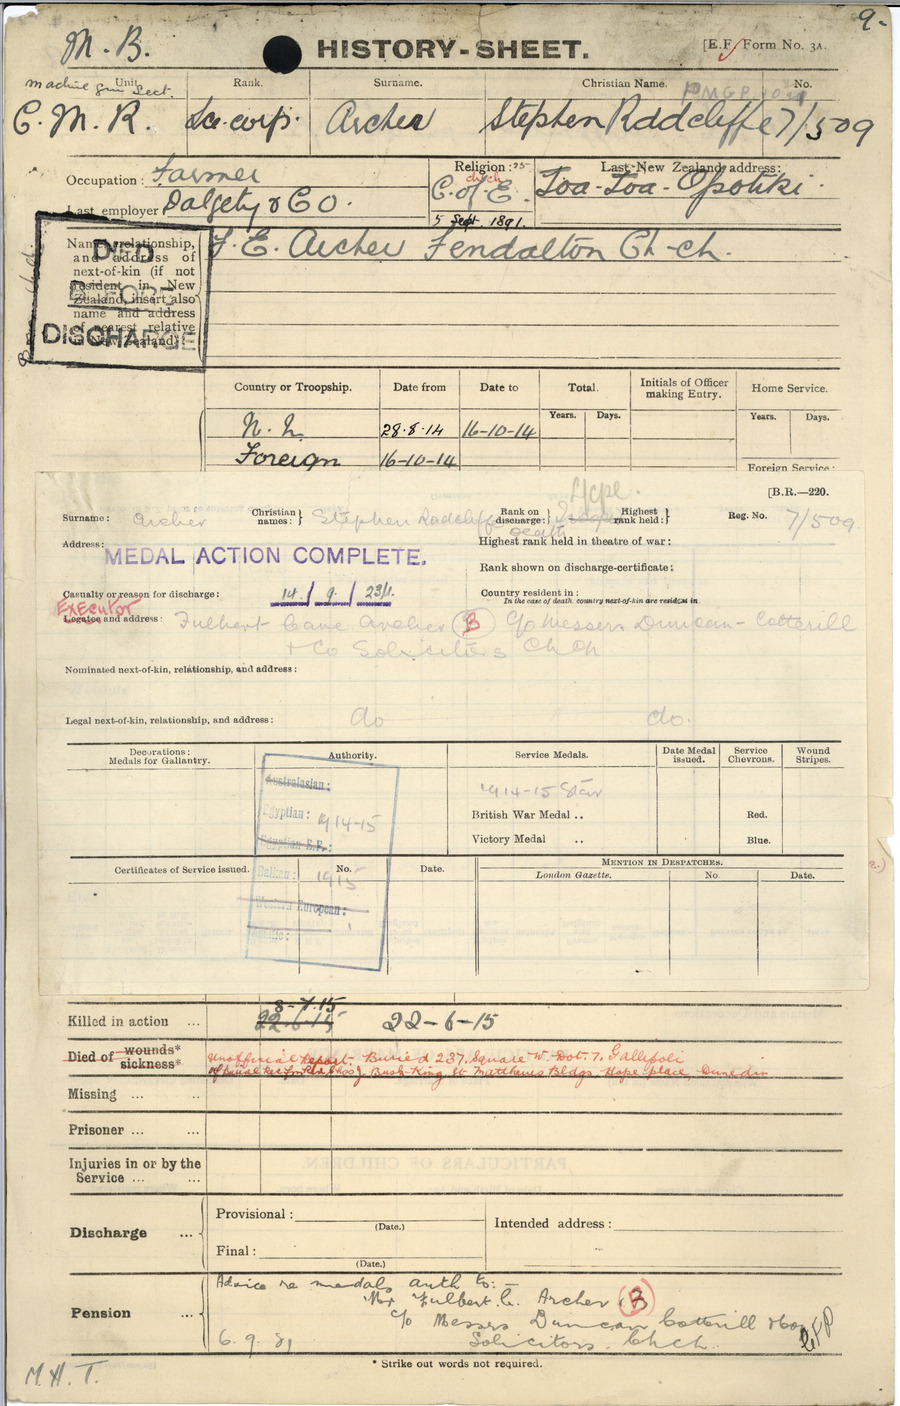 Archer SR History Sheet 1